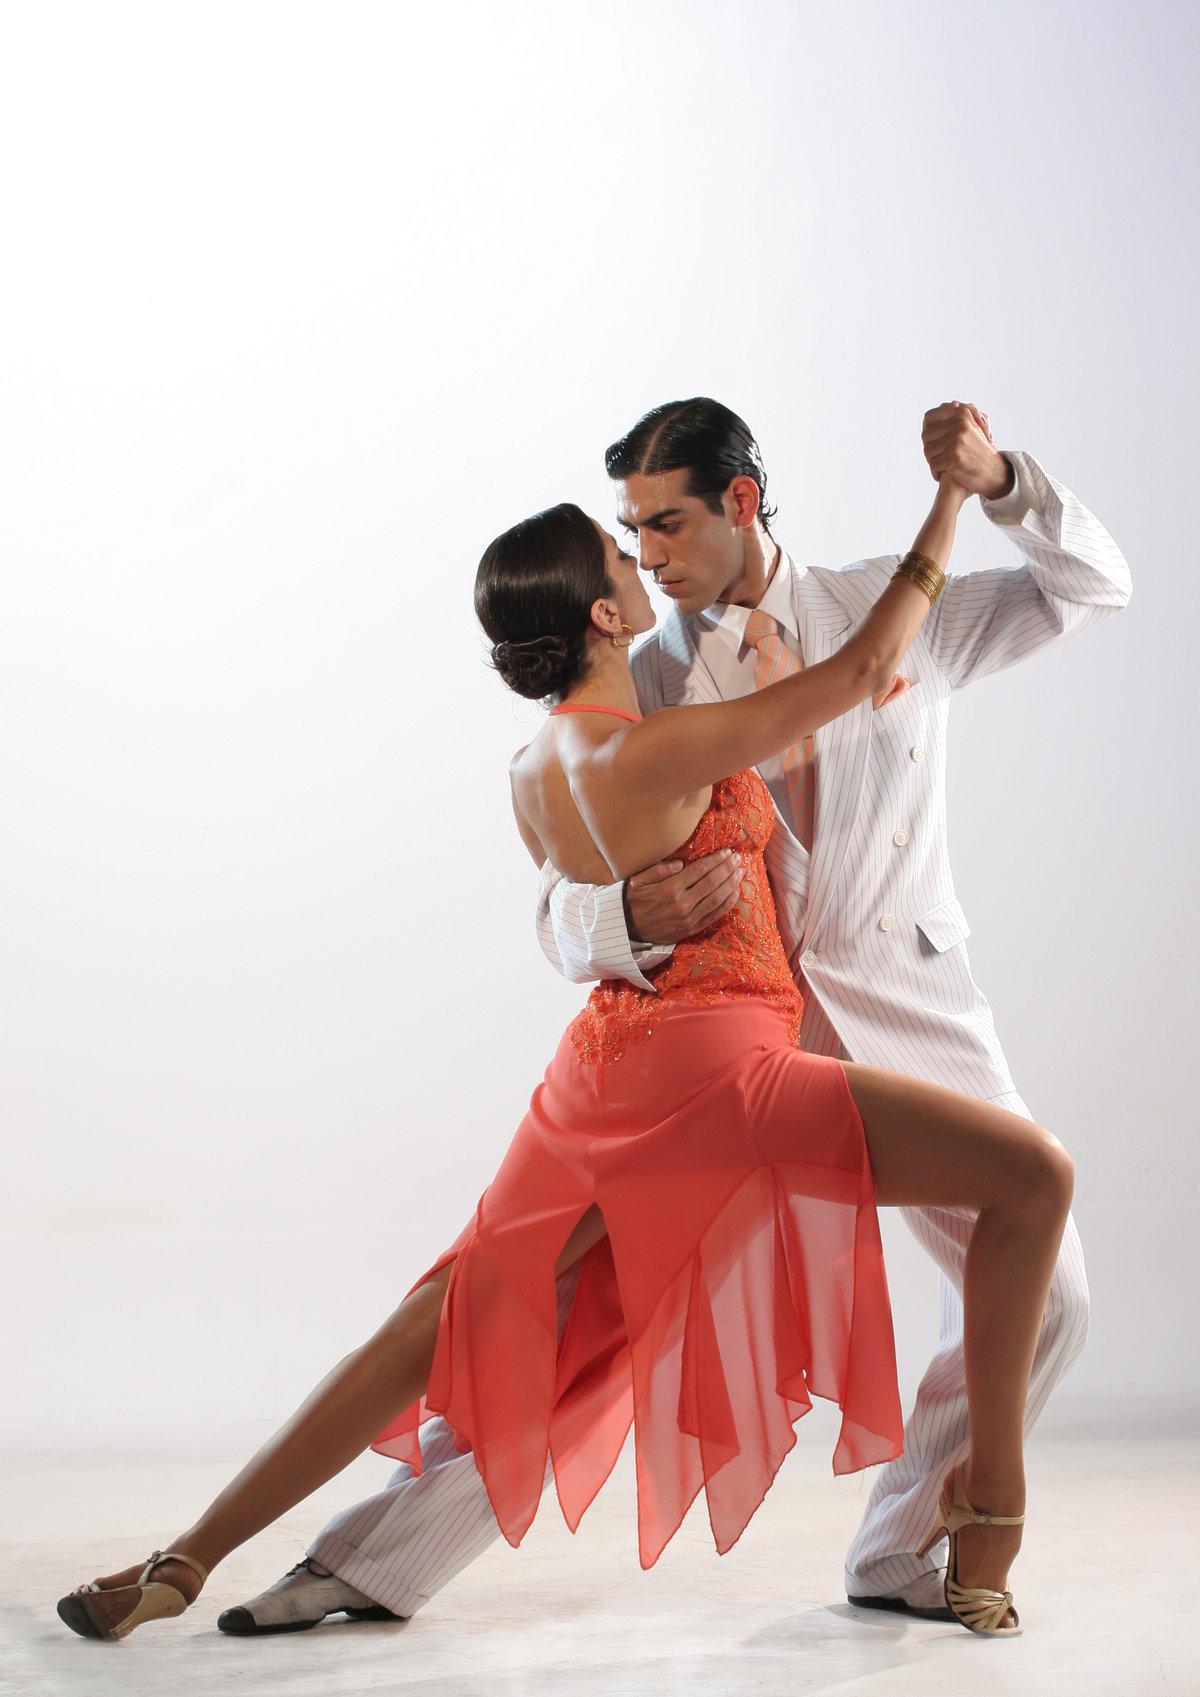 Пара в танце картинка